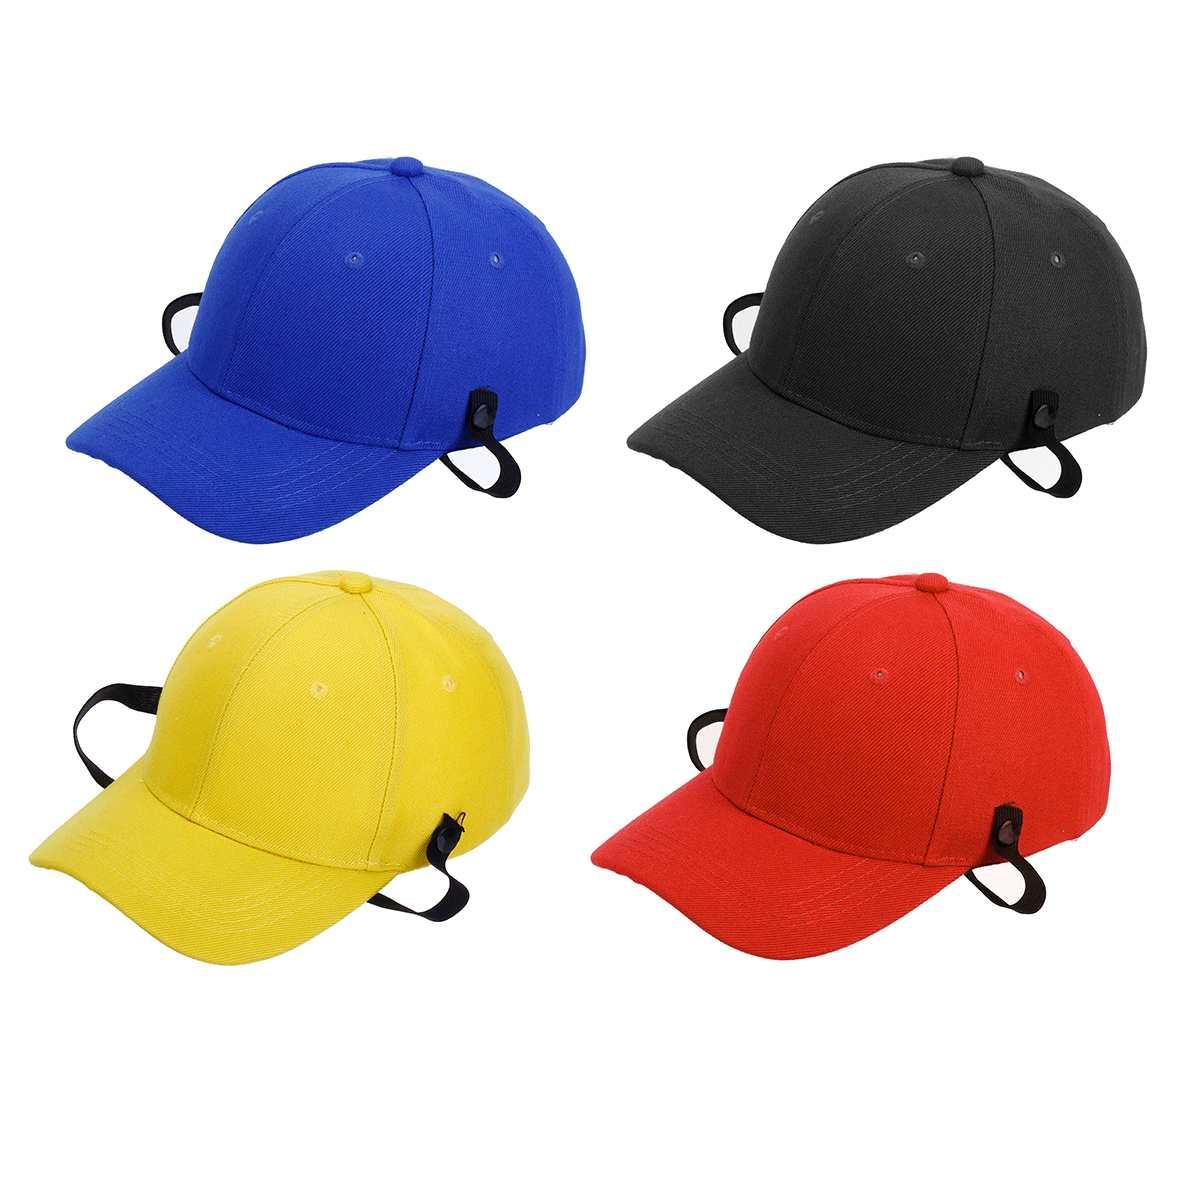 Cotton+Hard Plastic Strap Cap Hip Hop Hat Adjustable Baseball Cap Snapback Hat For Women Mens Caps